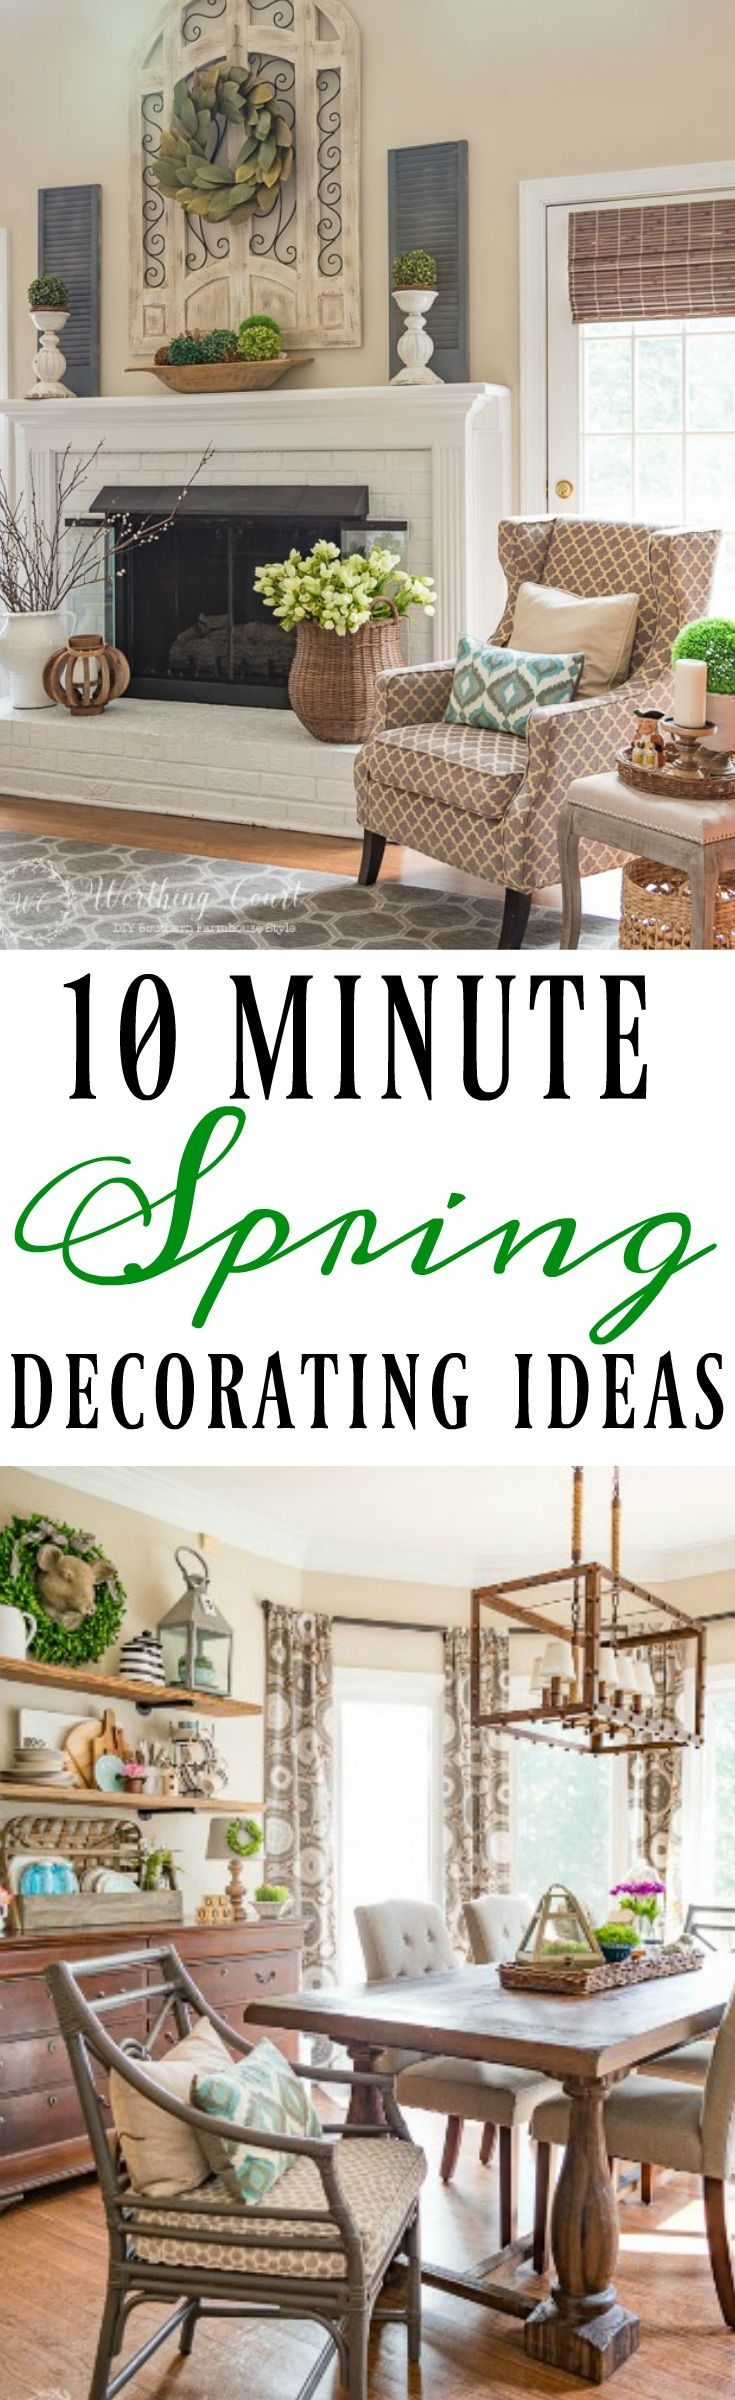 10 minute spring decorating ideas #springdecor #springdecorations #spring